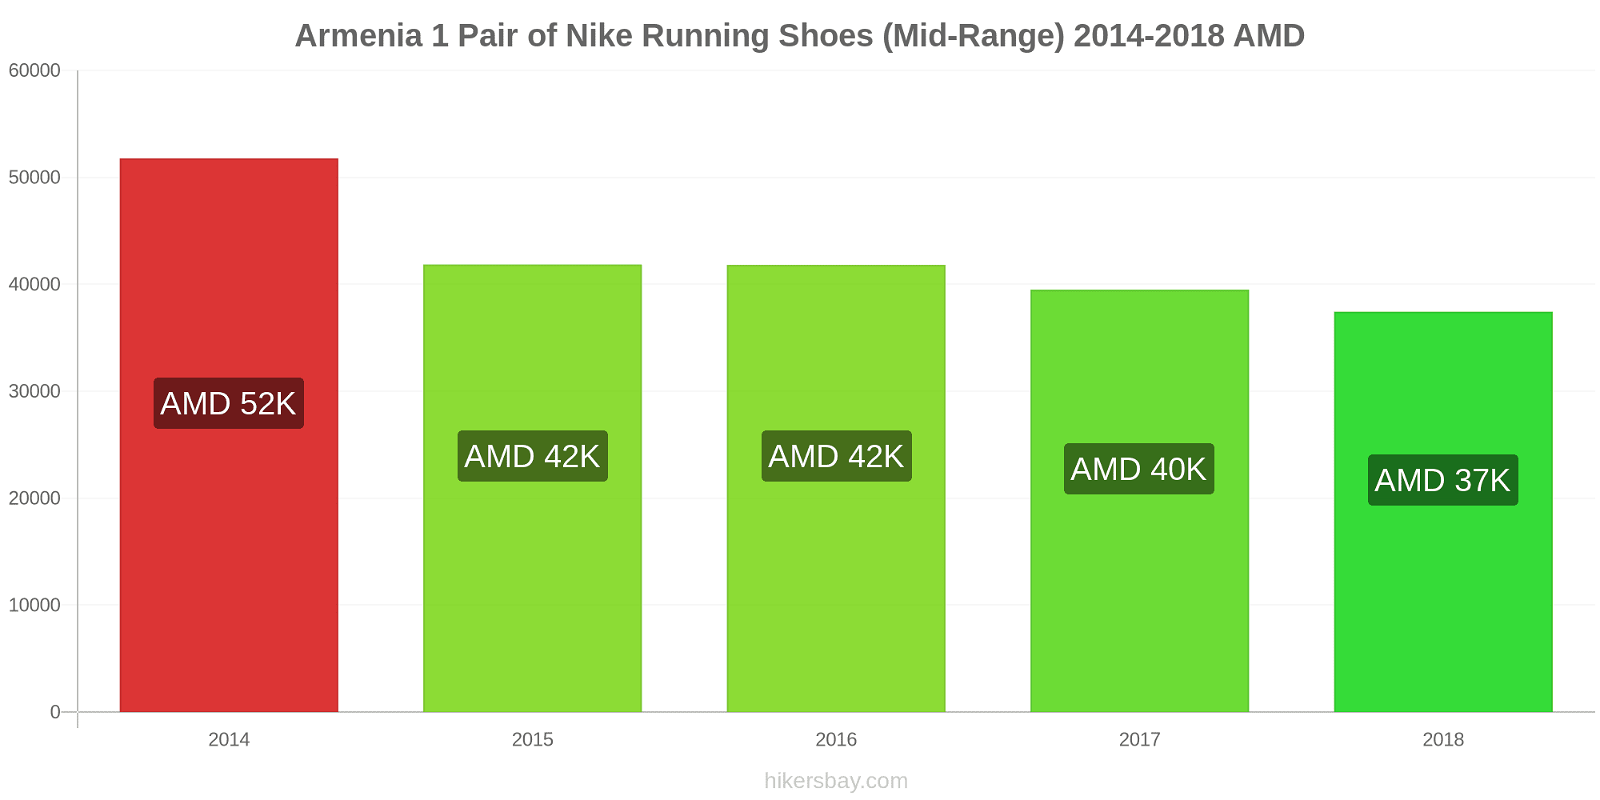 Armenia price changes 1 Pair of Nike Running Shoes (Mid-Range) hikersbay.com